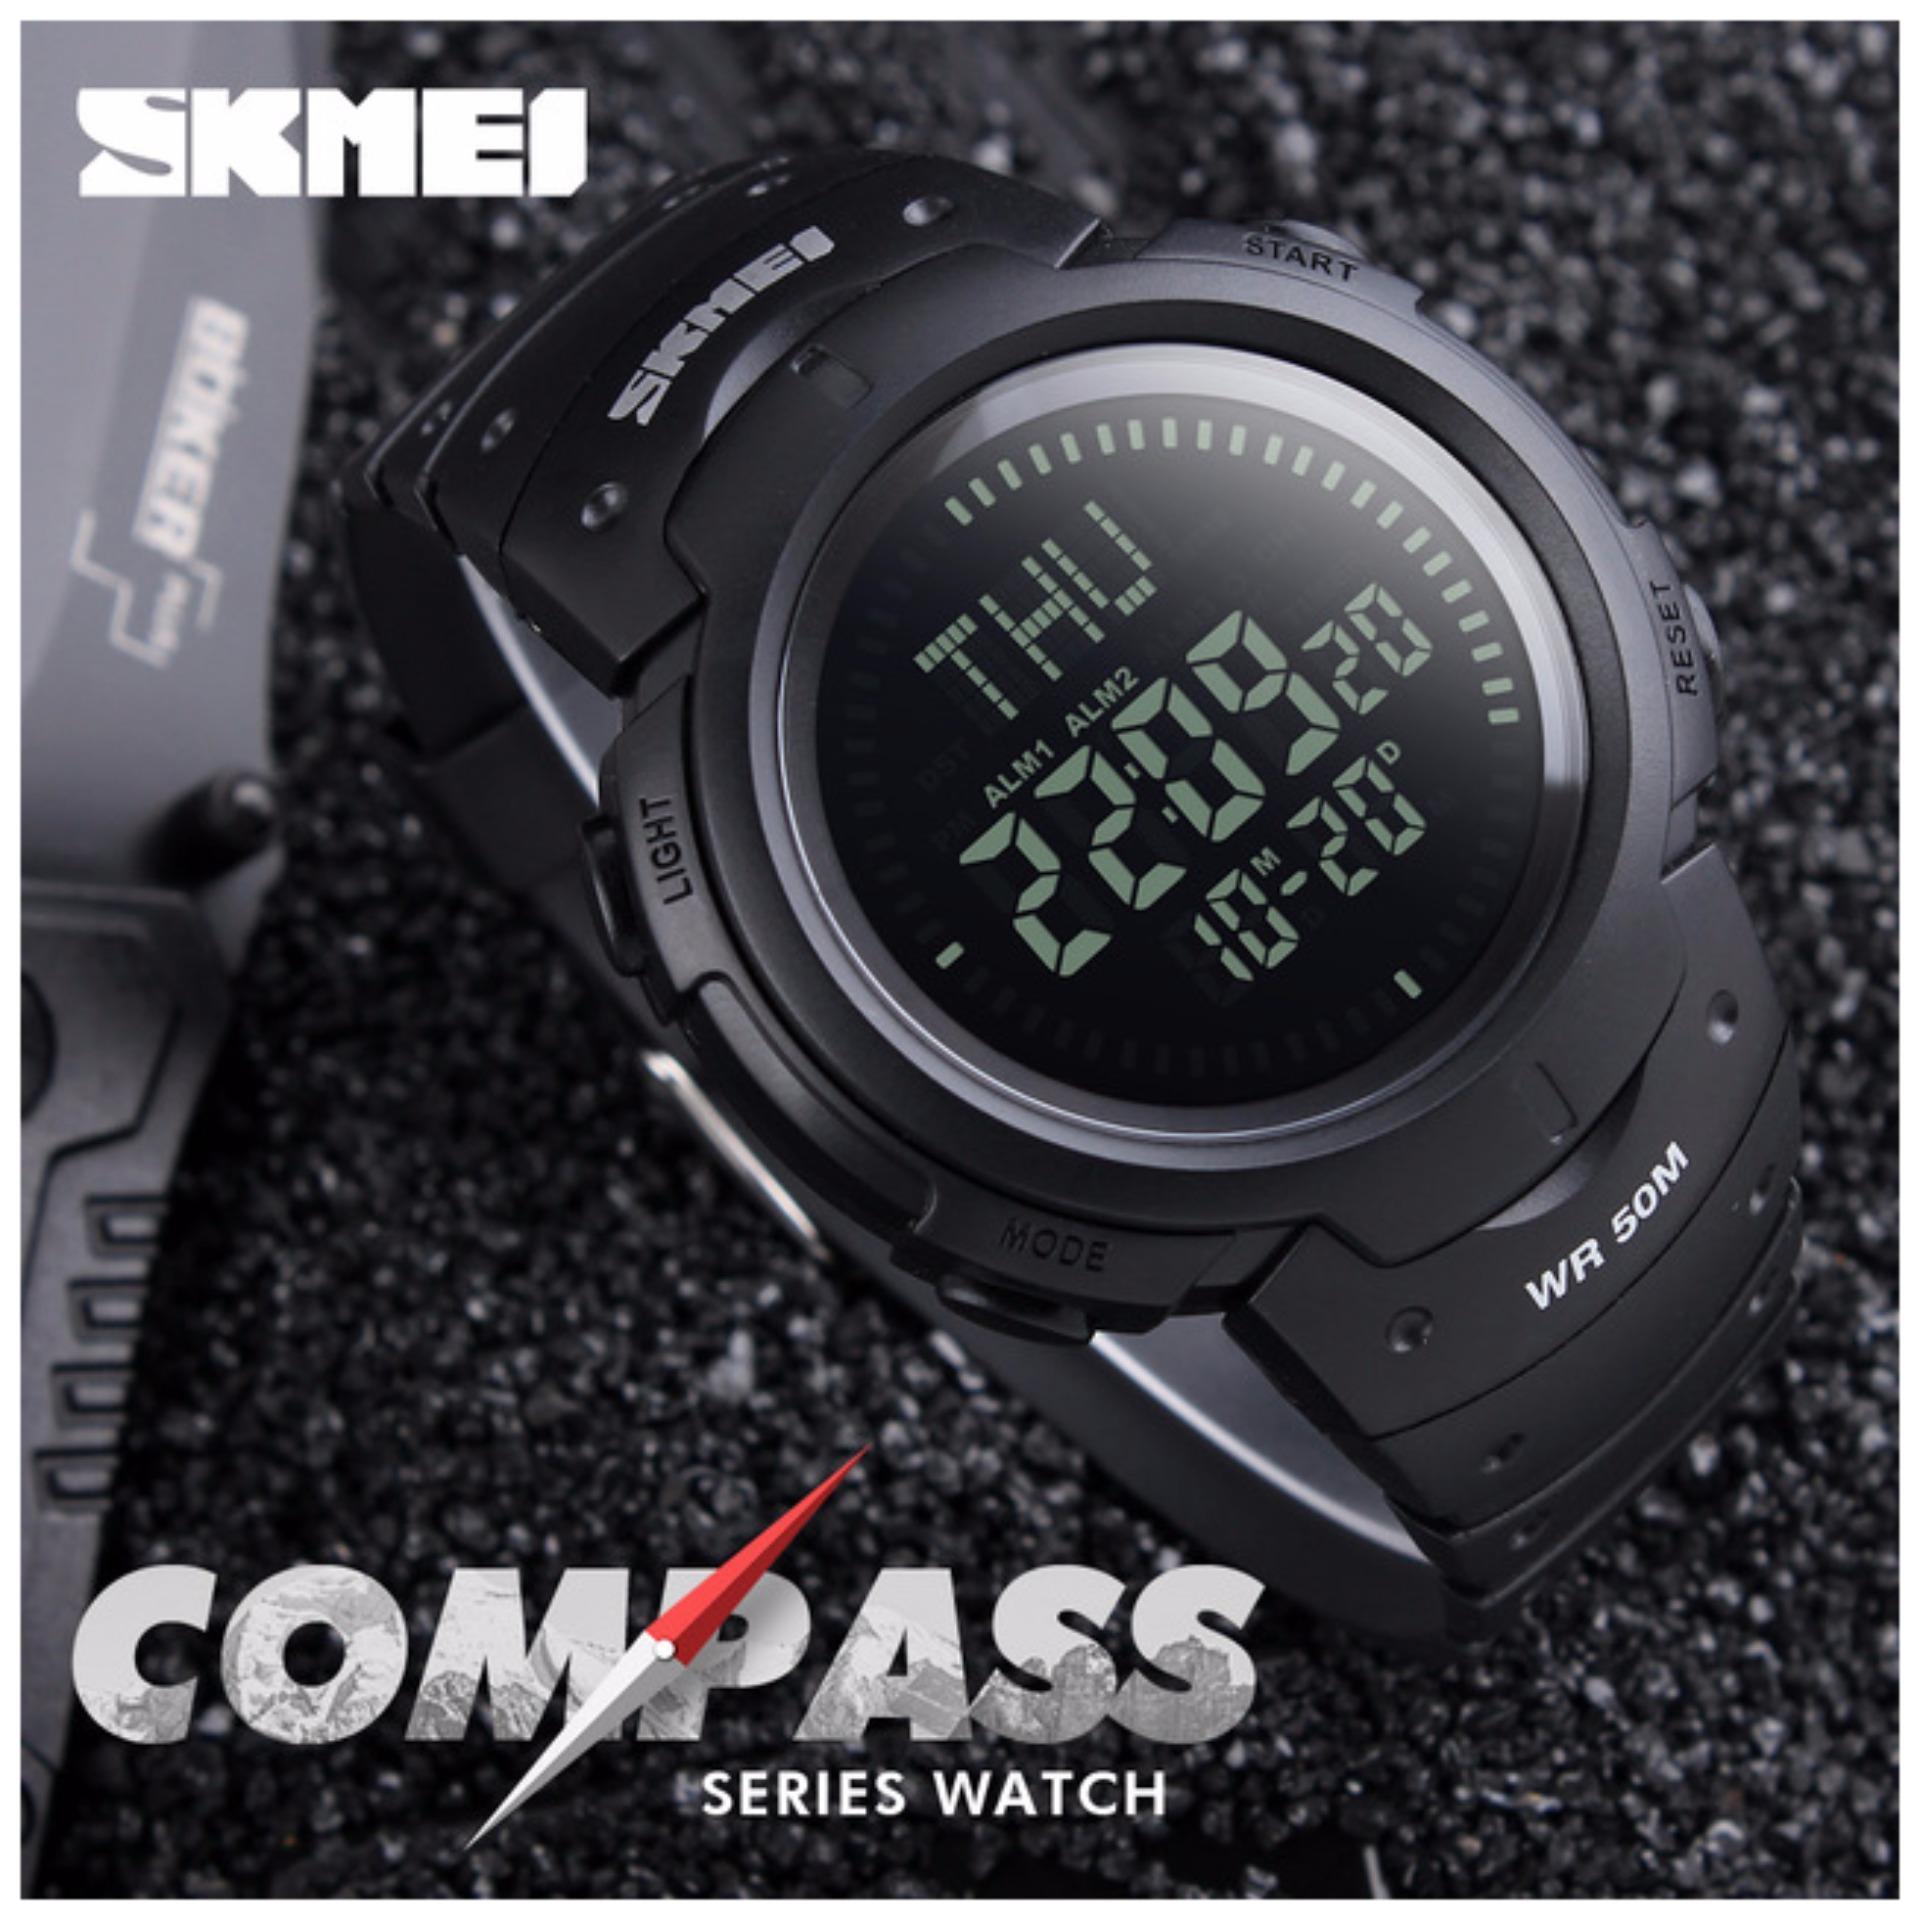 Merek Watch A Outdoor Kompas Digital Pria Countdown Olahraga Jam Source · SKMEI Compass 1231 Original Jam Tangan Pria Sport Outdoor Anti Air